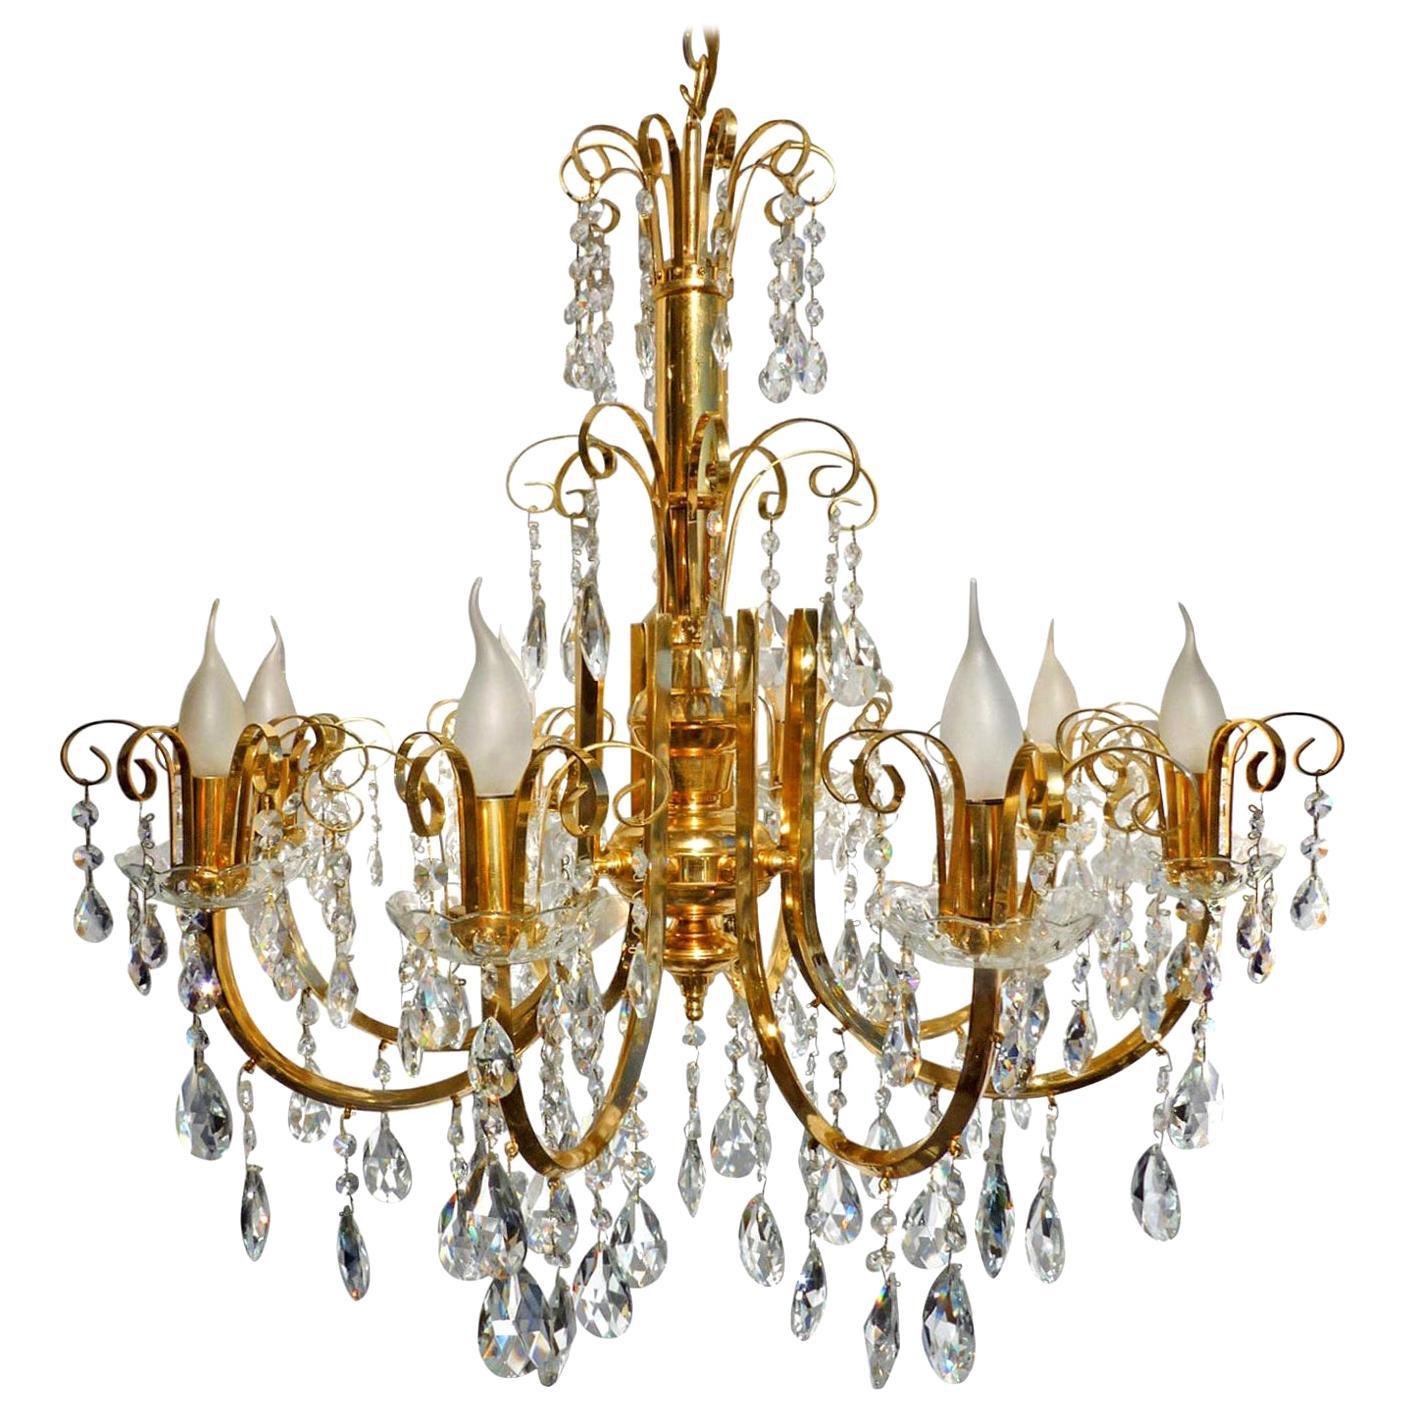 Large Hollywood Regency Crystal Cascade Waterfall Gilt Brass 8-Light Chandelier